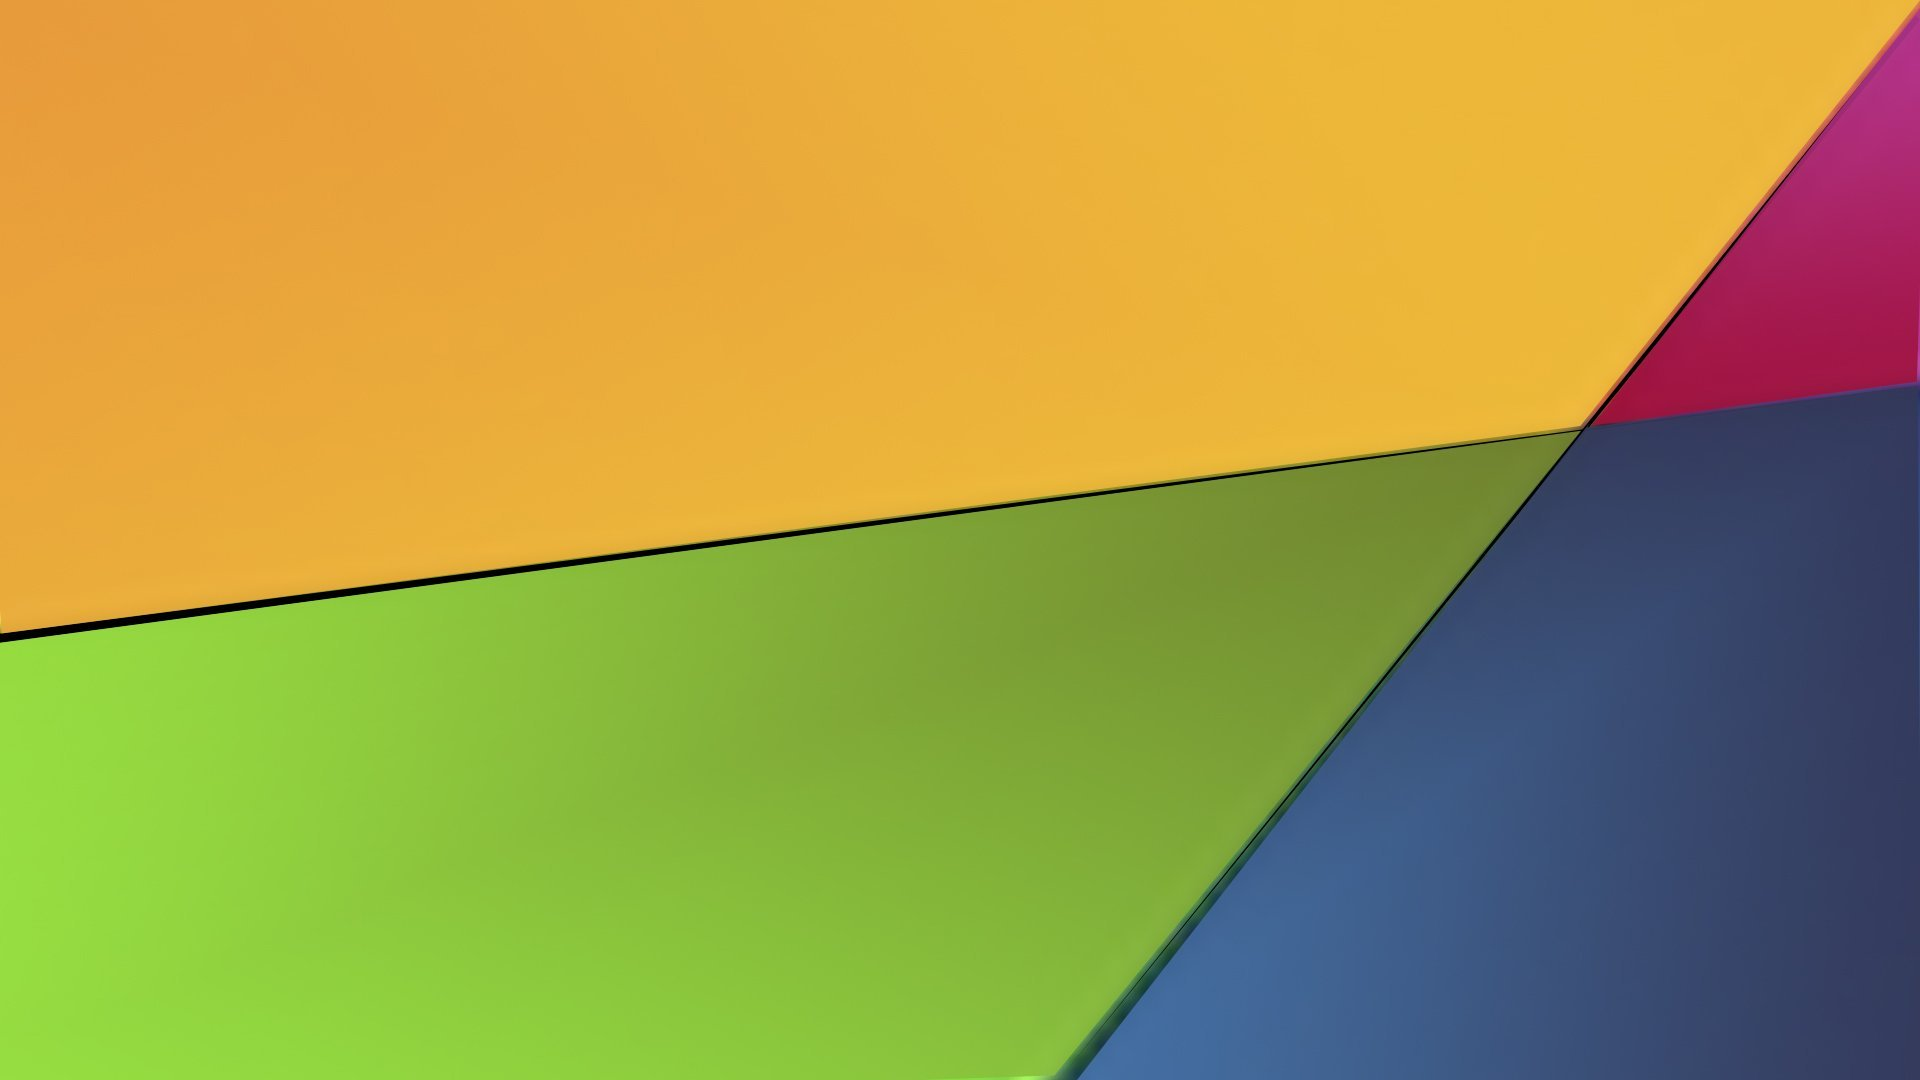 Chromebook HD Wallpapers 1920x1080